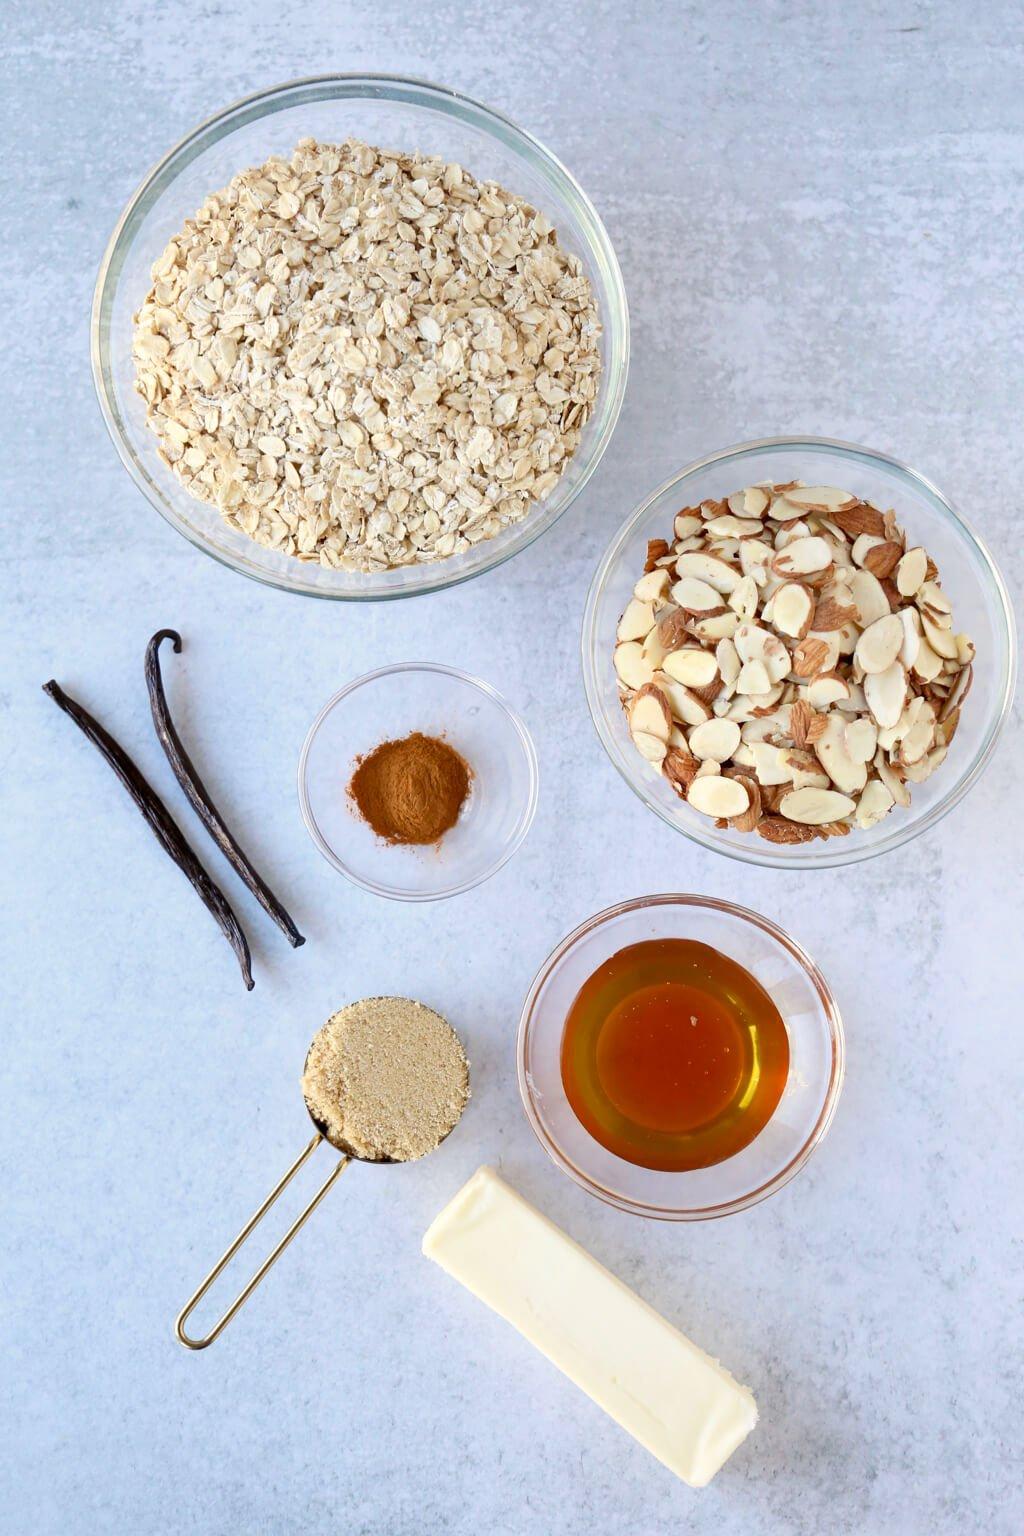 a bowl of oats, almonds, cinnamon, honey, brown sugar, butter and vanilla bean to make granola